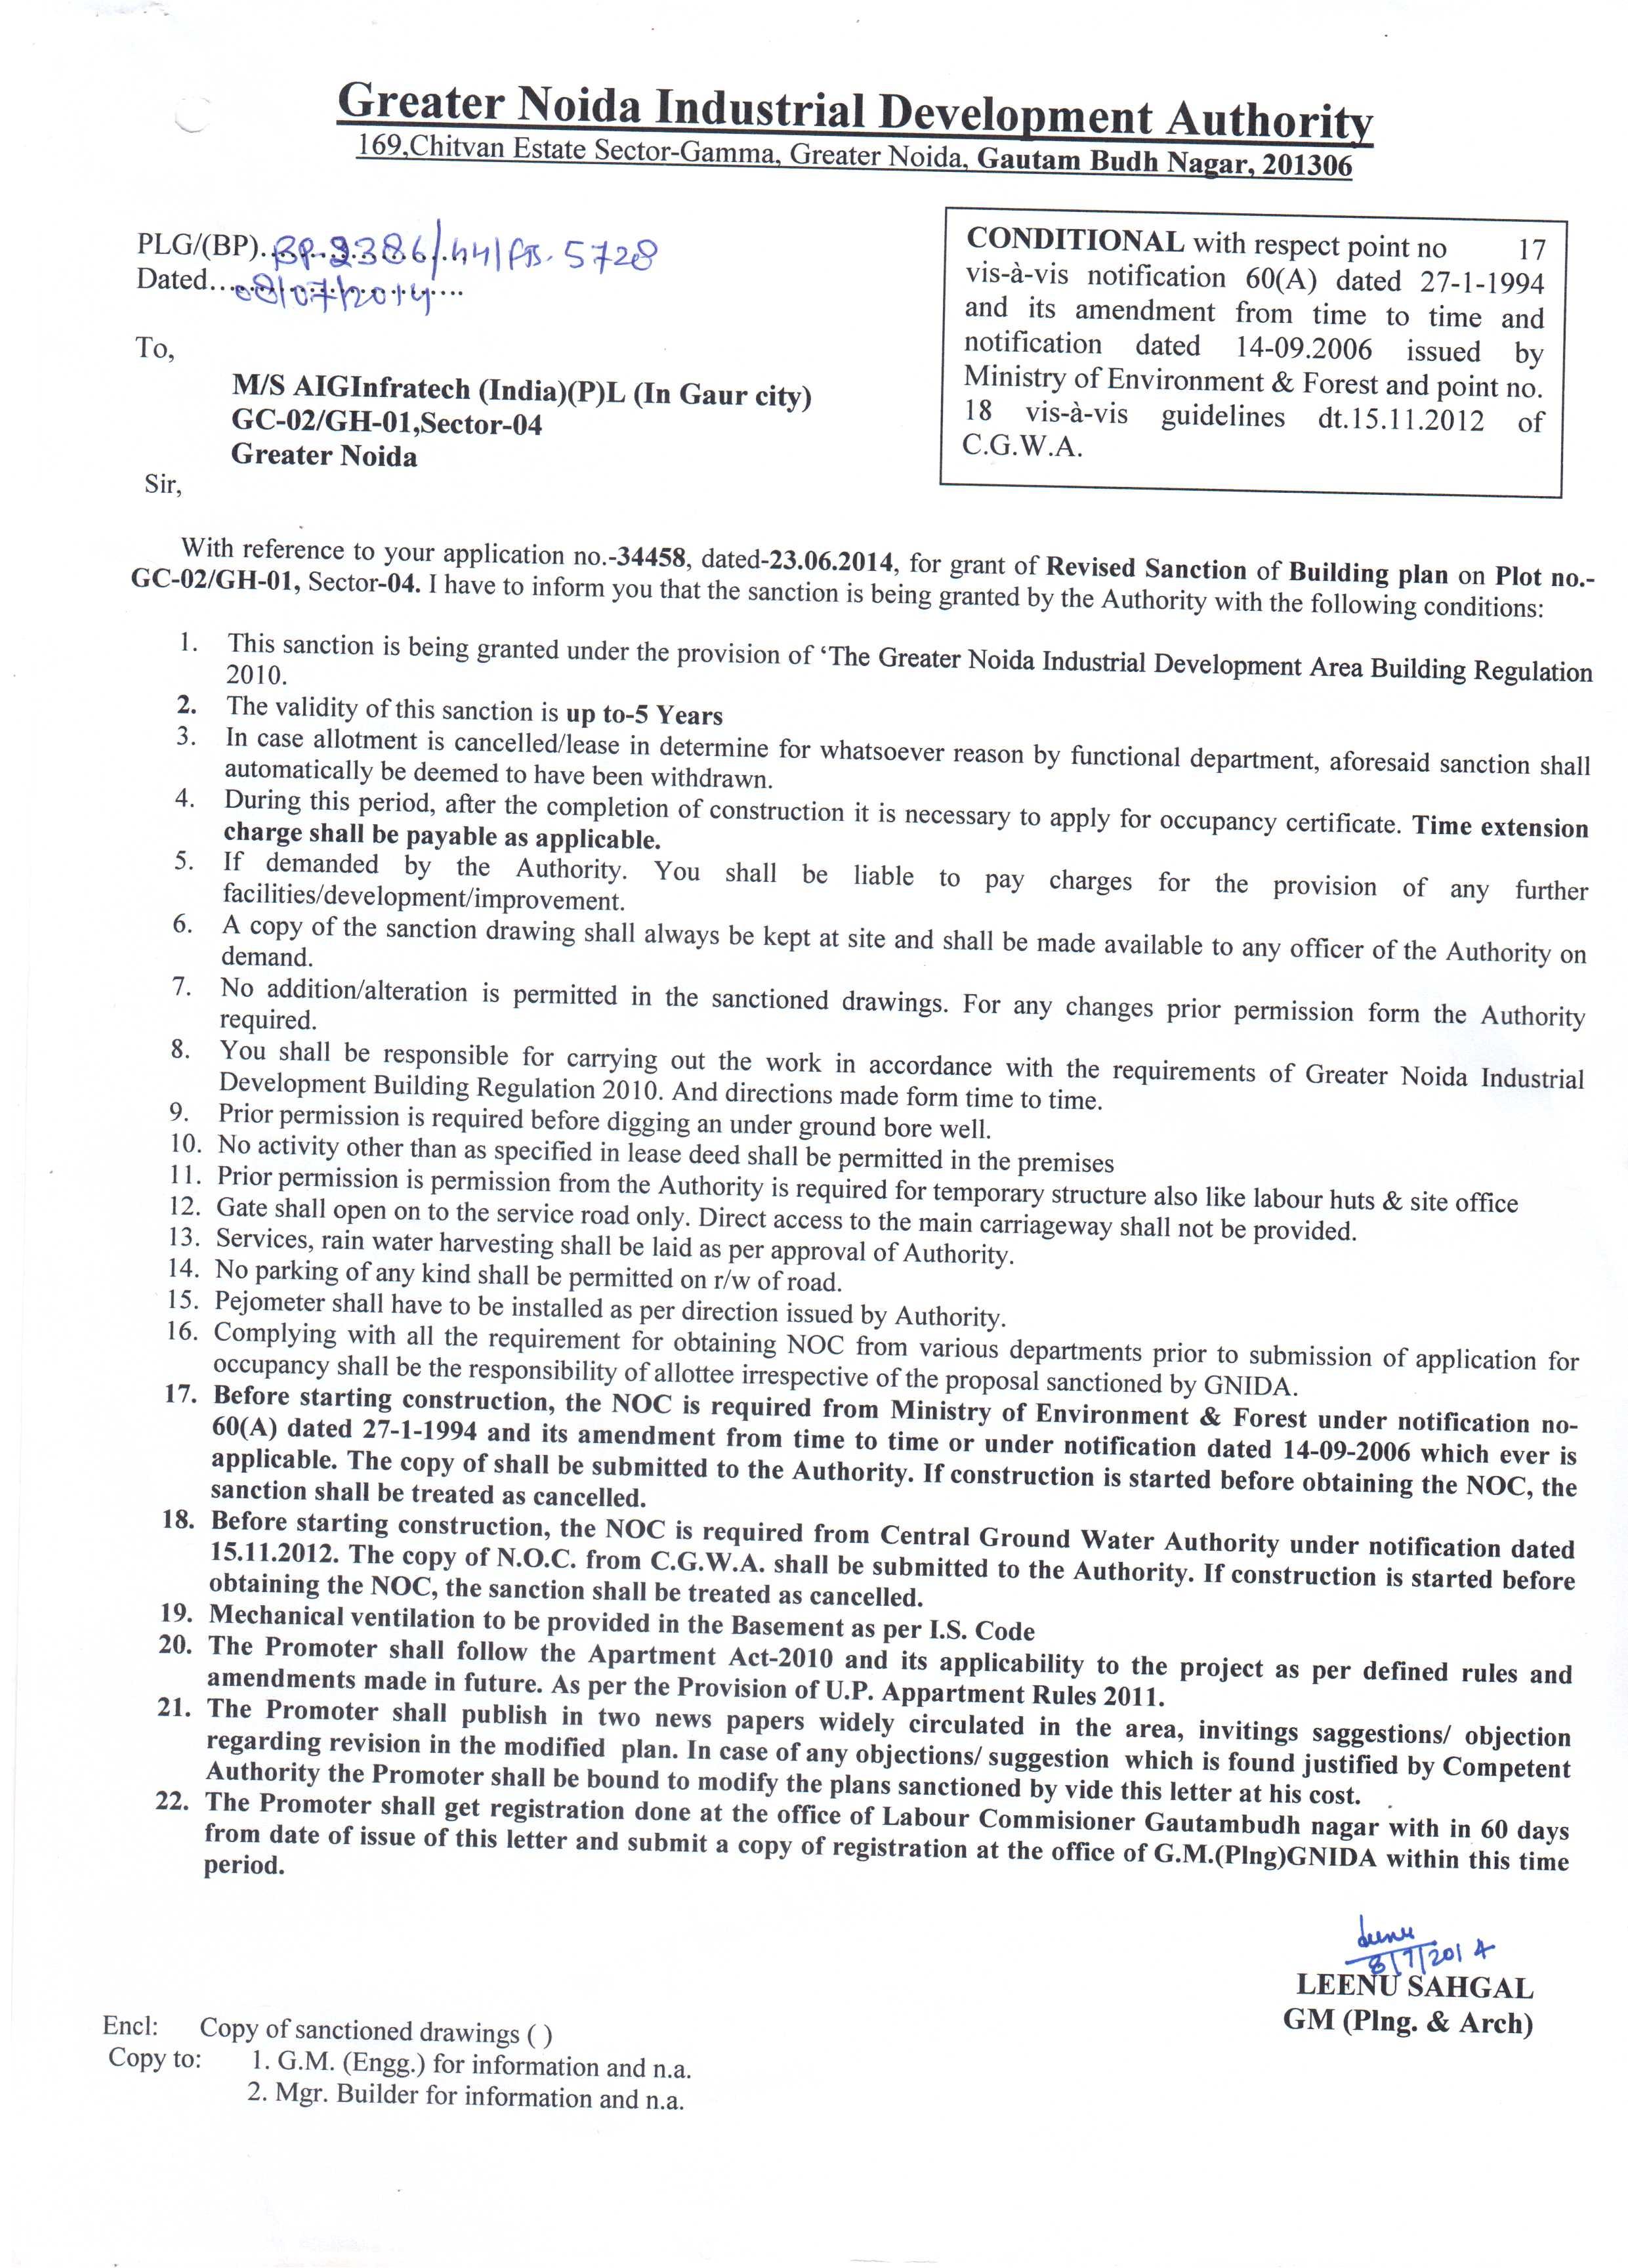 Gaur City Gc 2 Gh 01 Sec 4 Greater Noida